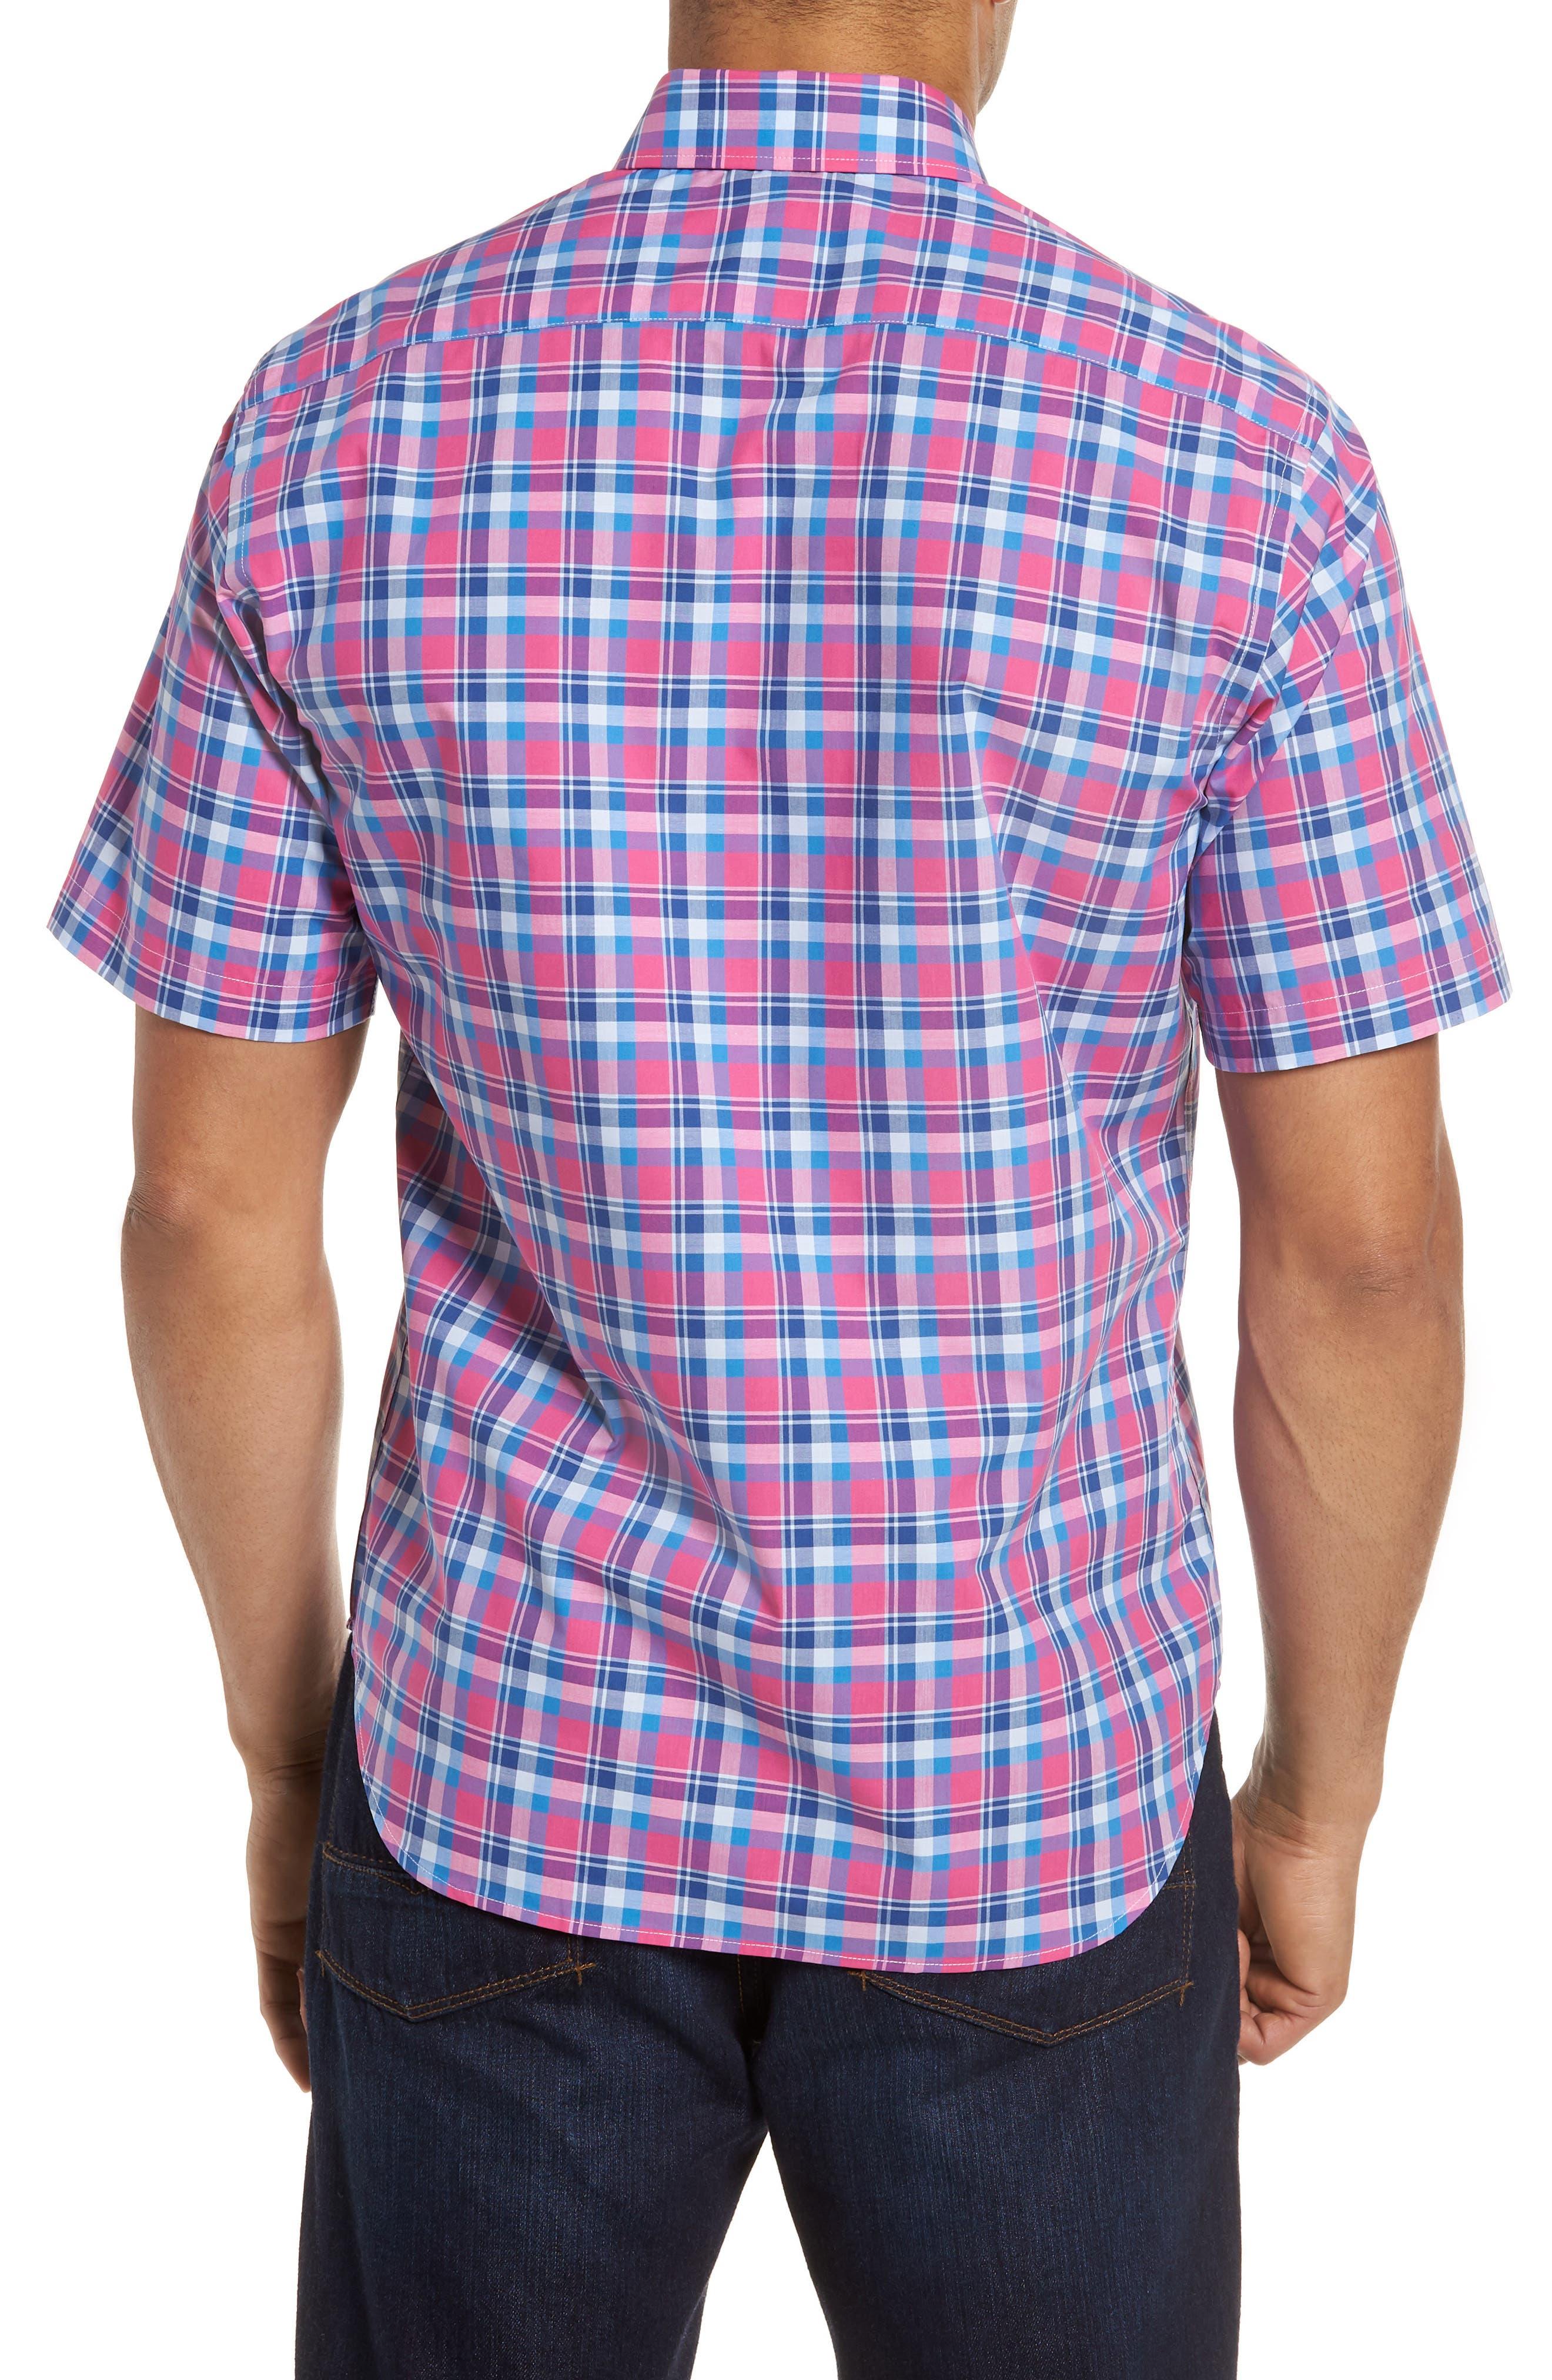 Sloane Regular Fit Plaid Sport Shirt,                             Alternate thumbnail 2, color,                             650